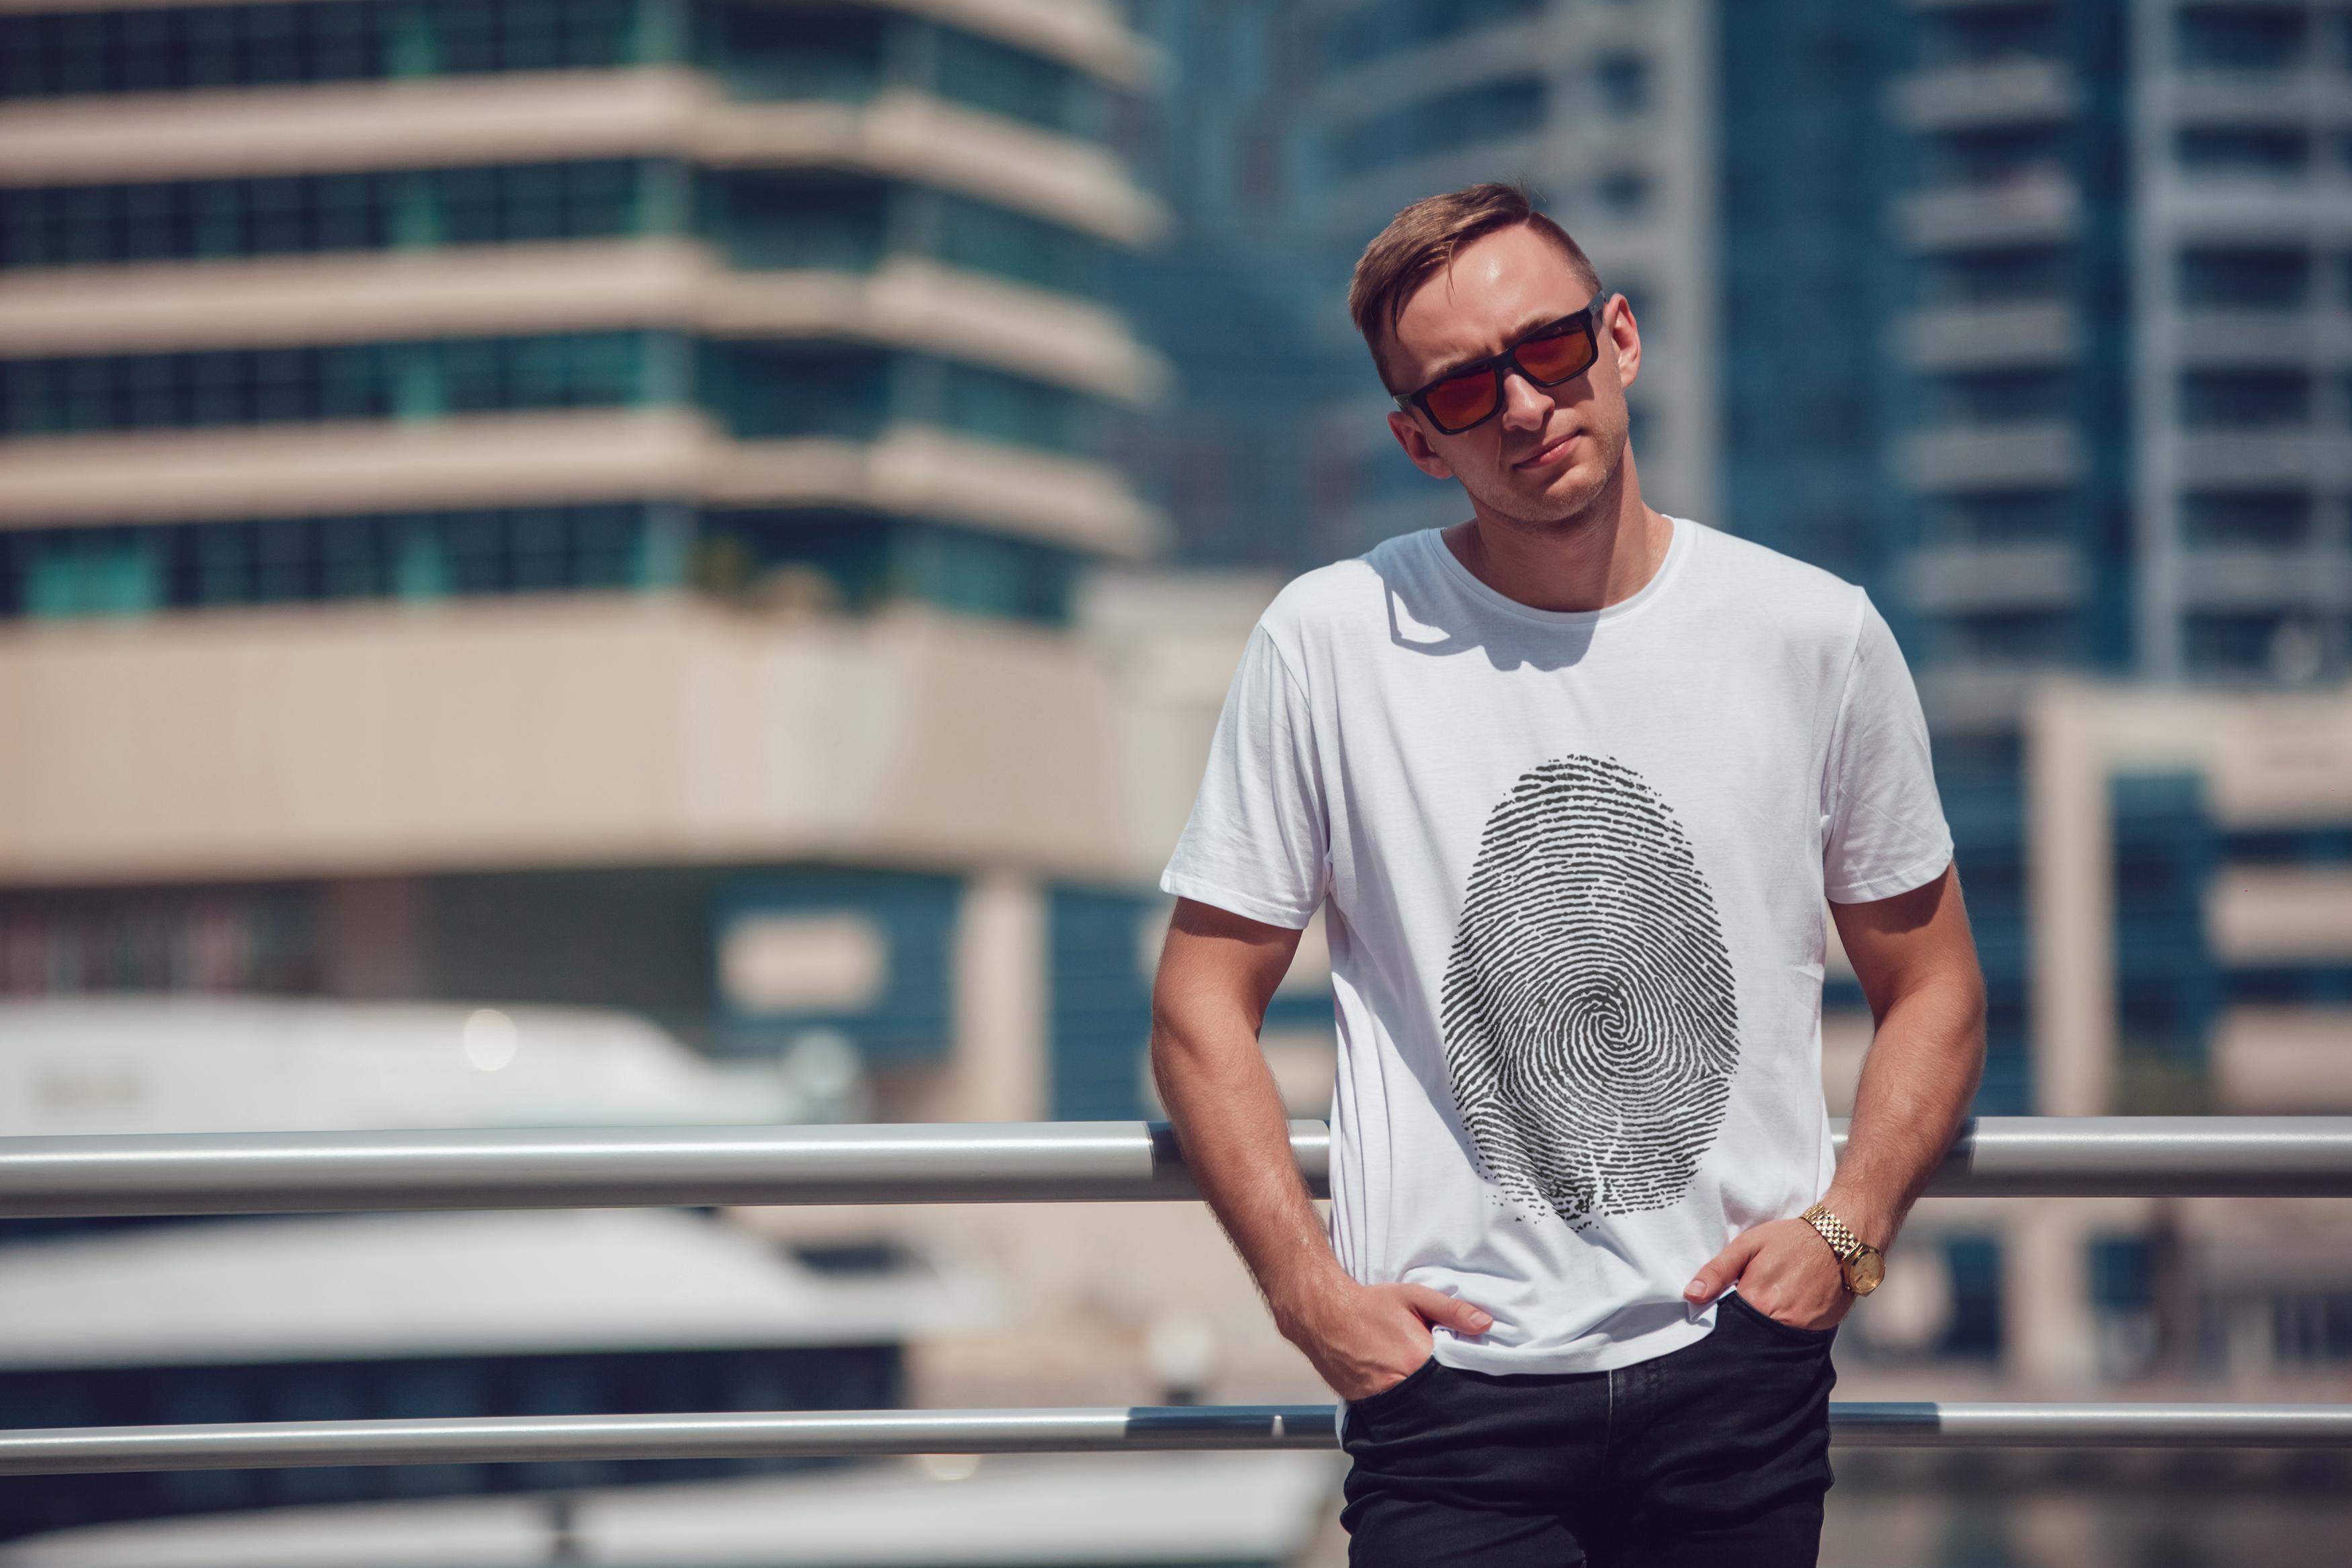 Men's T-Shirt Mock-Up Vol.5 2017 example image 7